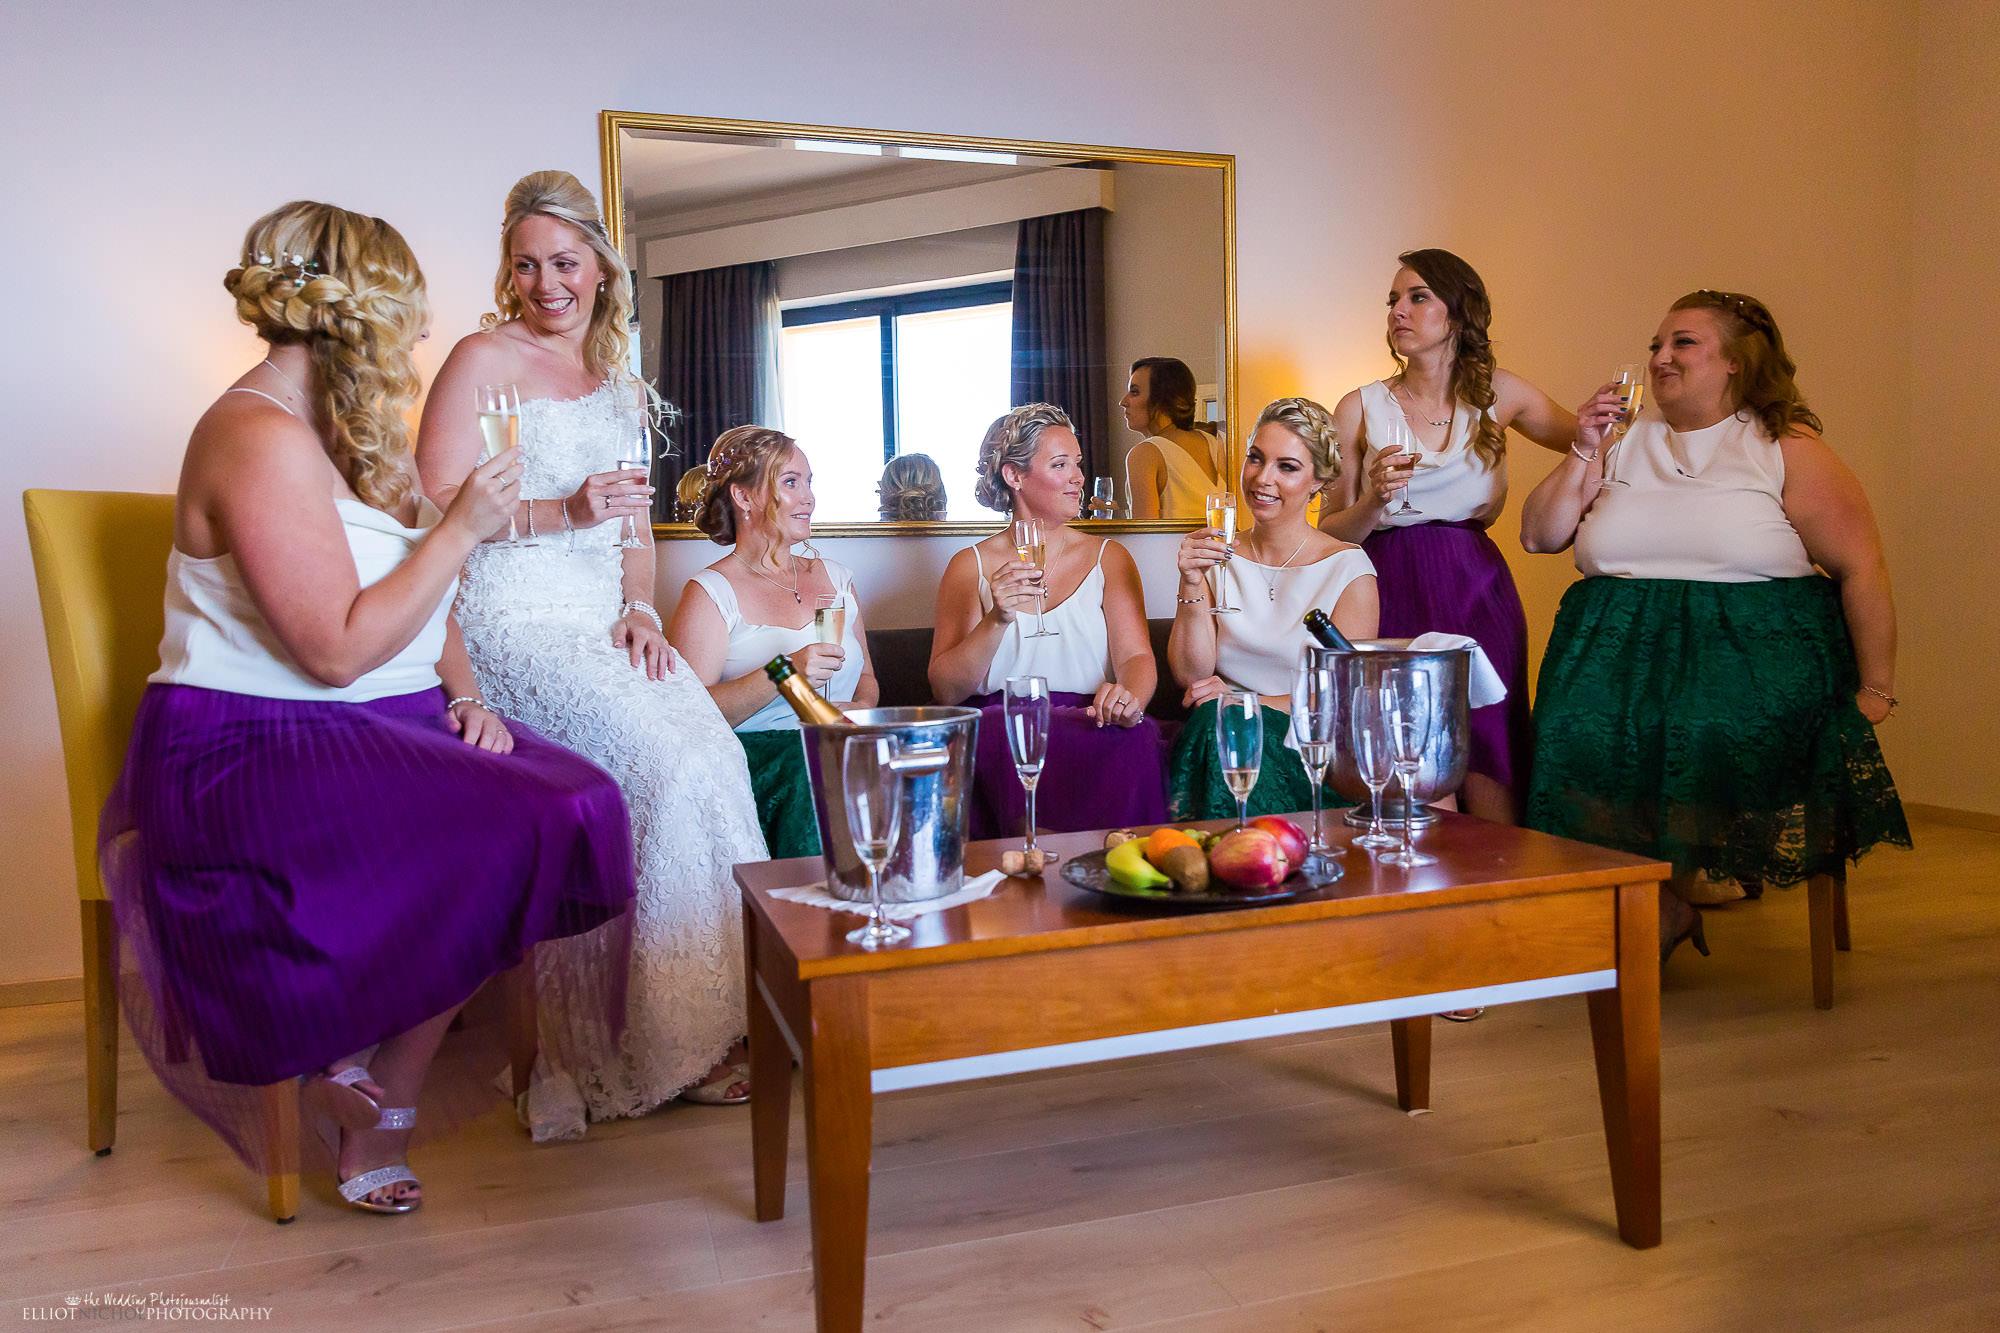 bride-bridesmaids-champagne-wedding-photography-photographer-weddings-UK